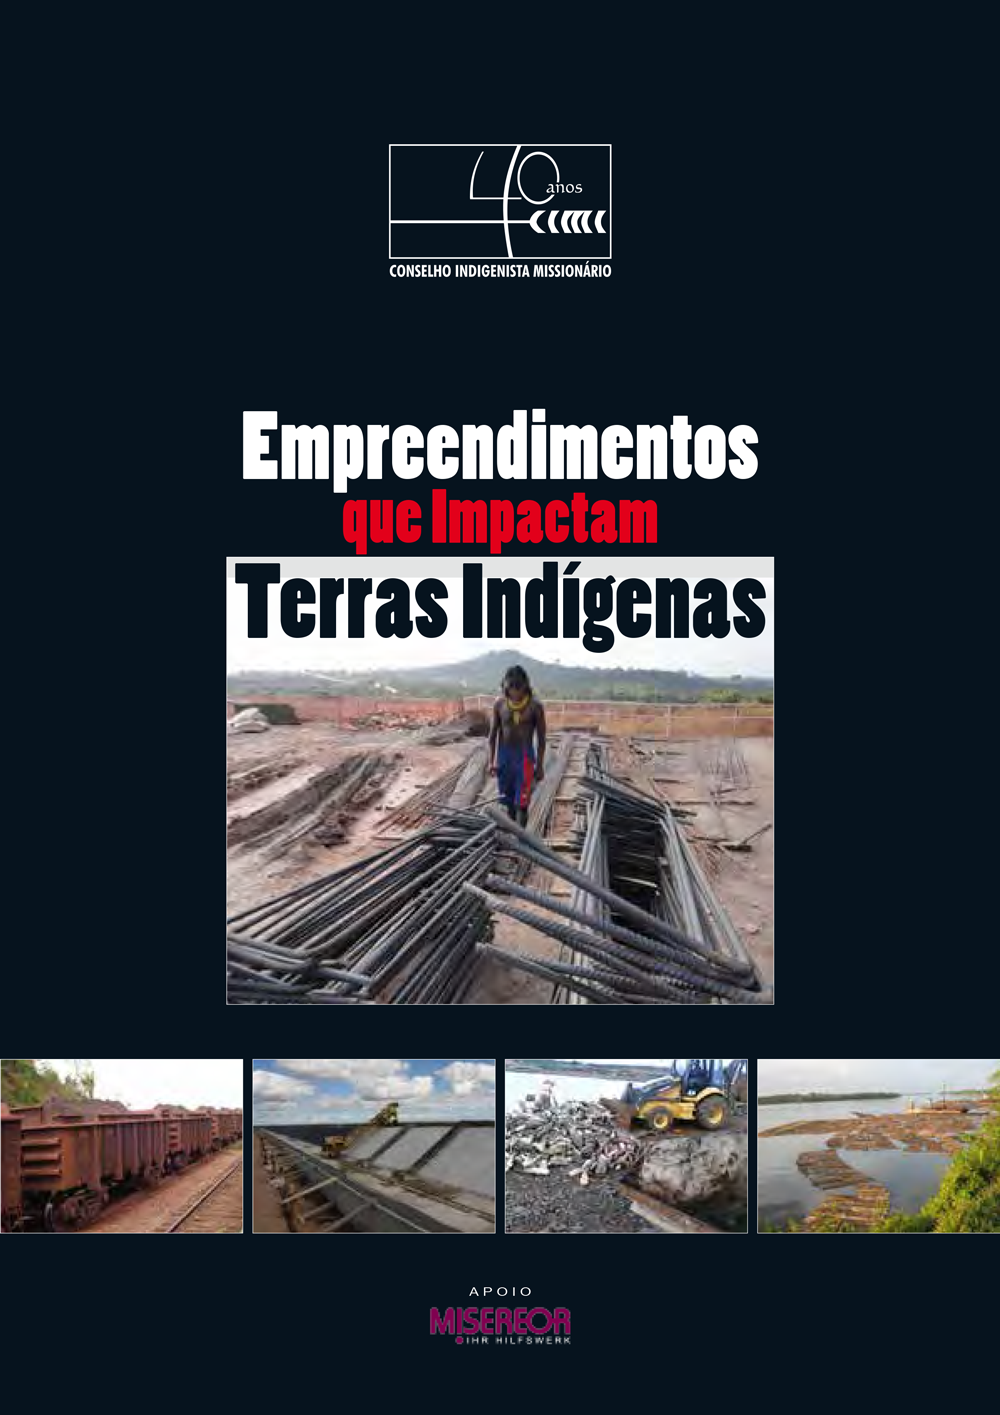 terras indígenas02366 Revisao Agricultura E Pescas #21